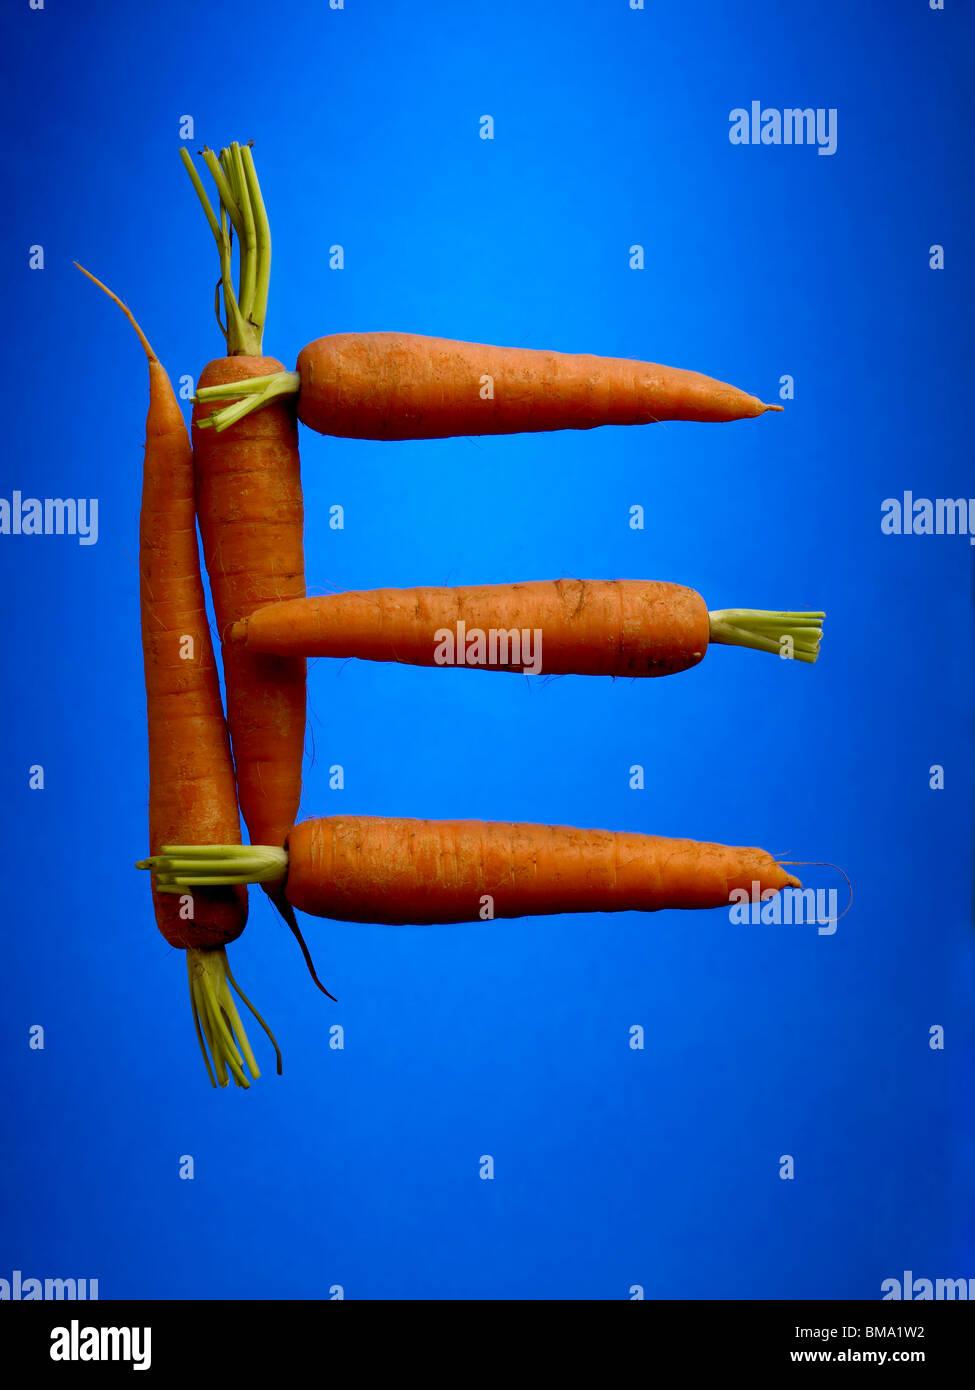 food letter E - Stock Image